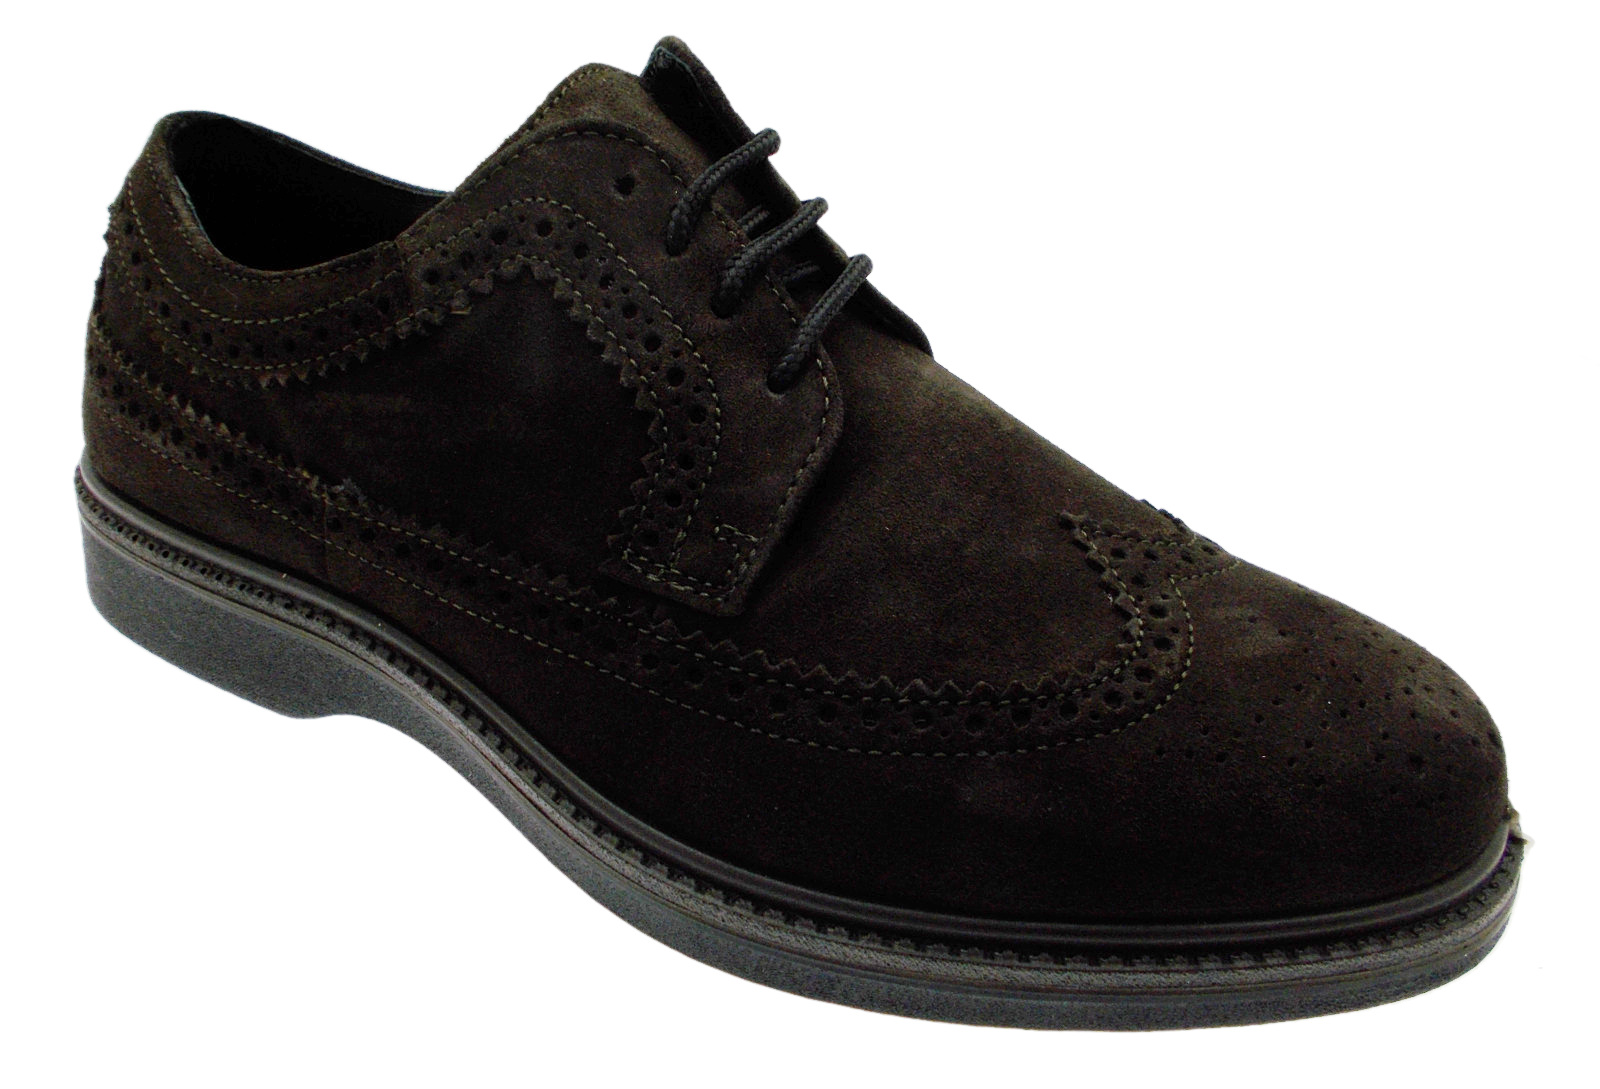 G0292 English brown laces shoe orthopedic orthopedic man Loren